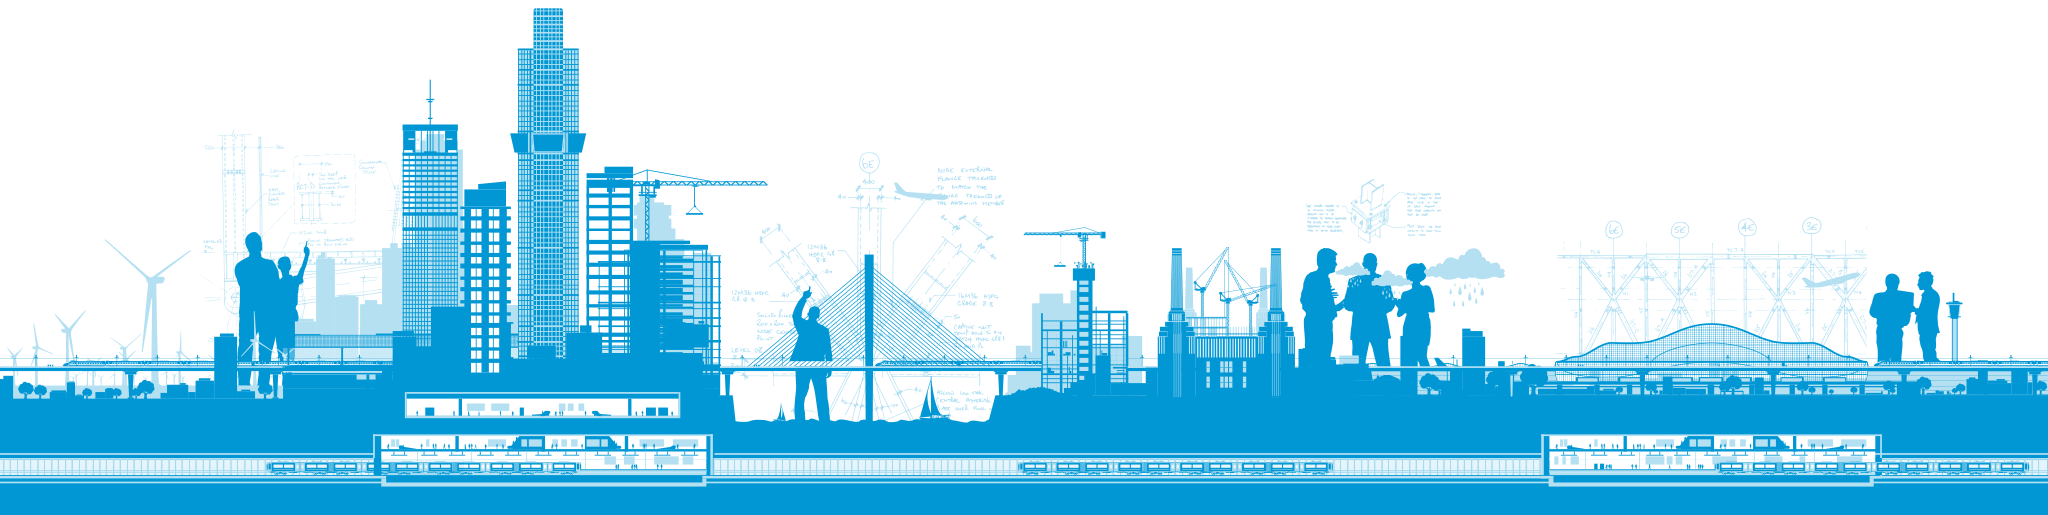 civil-engineering-top-image-tablet-min